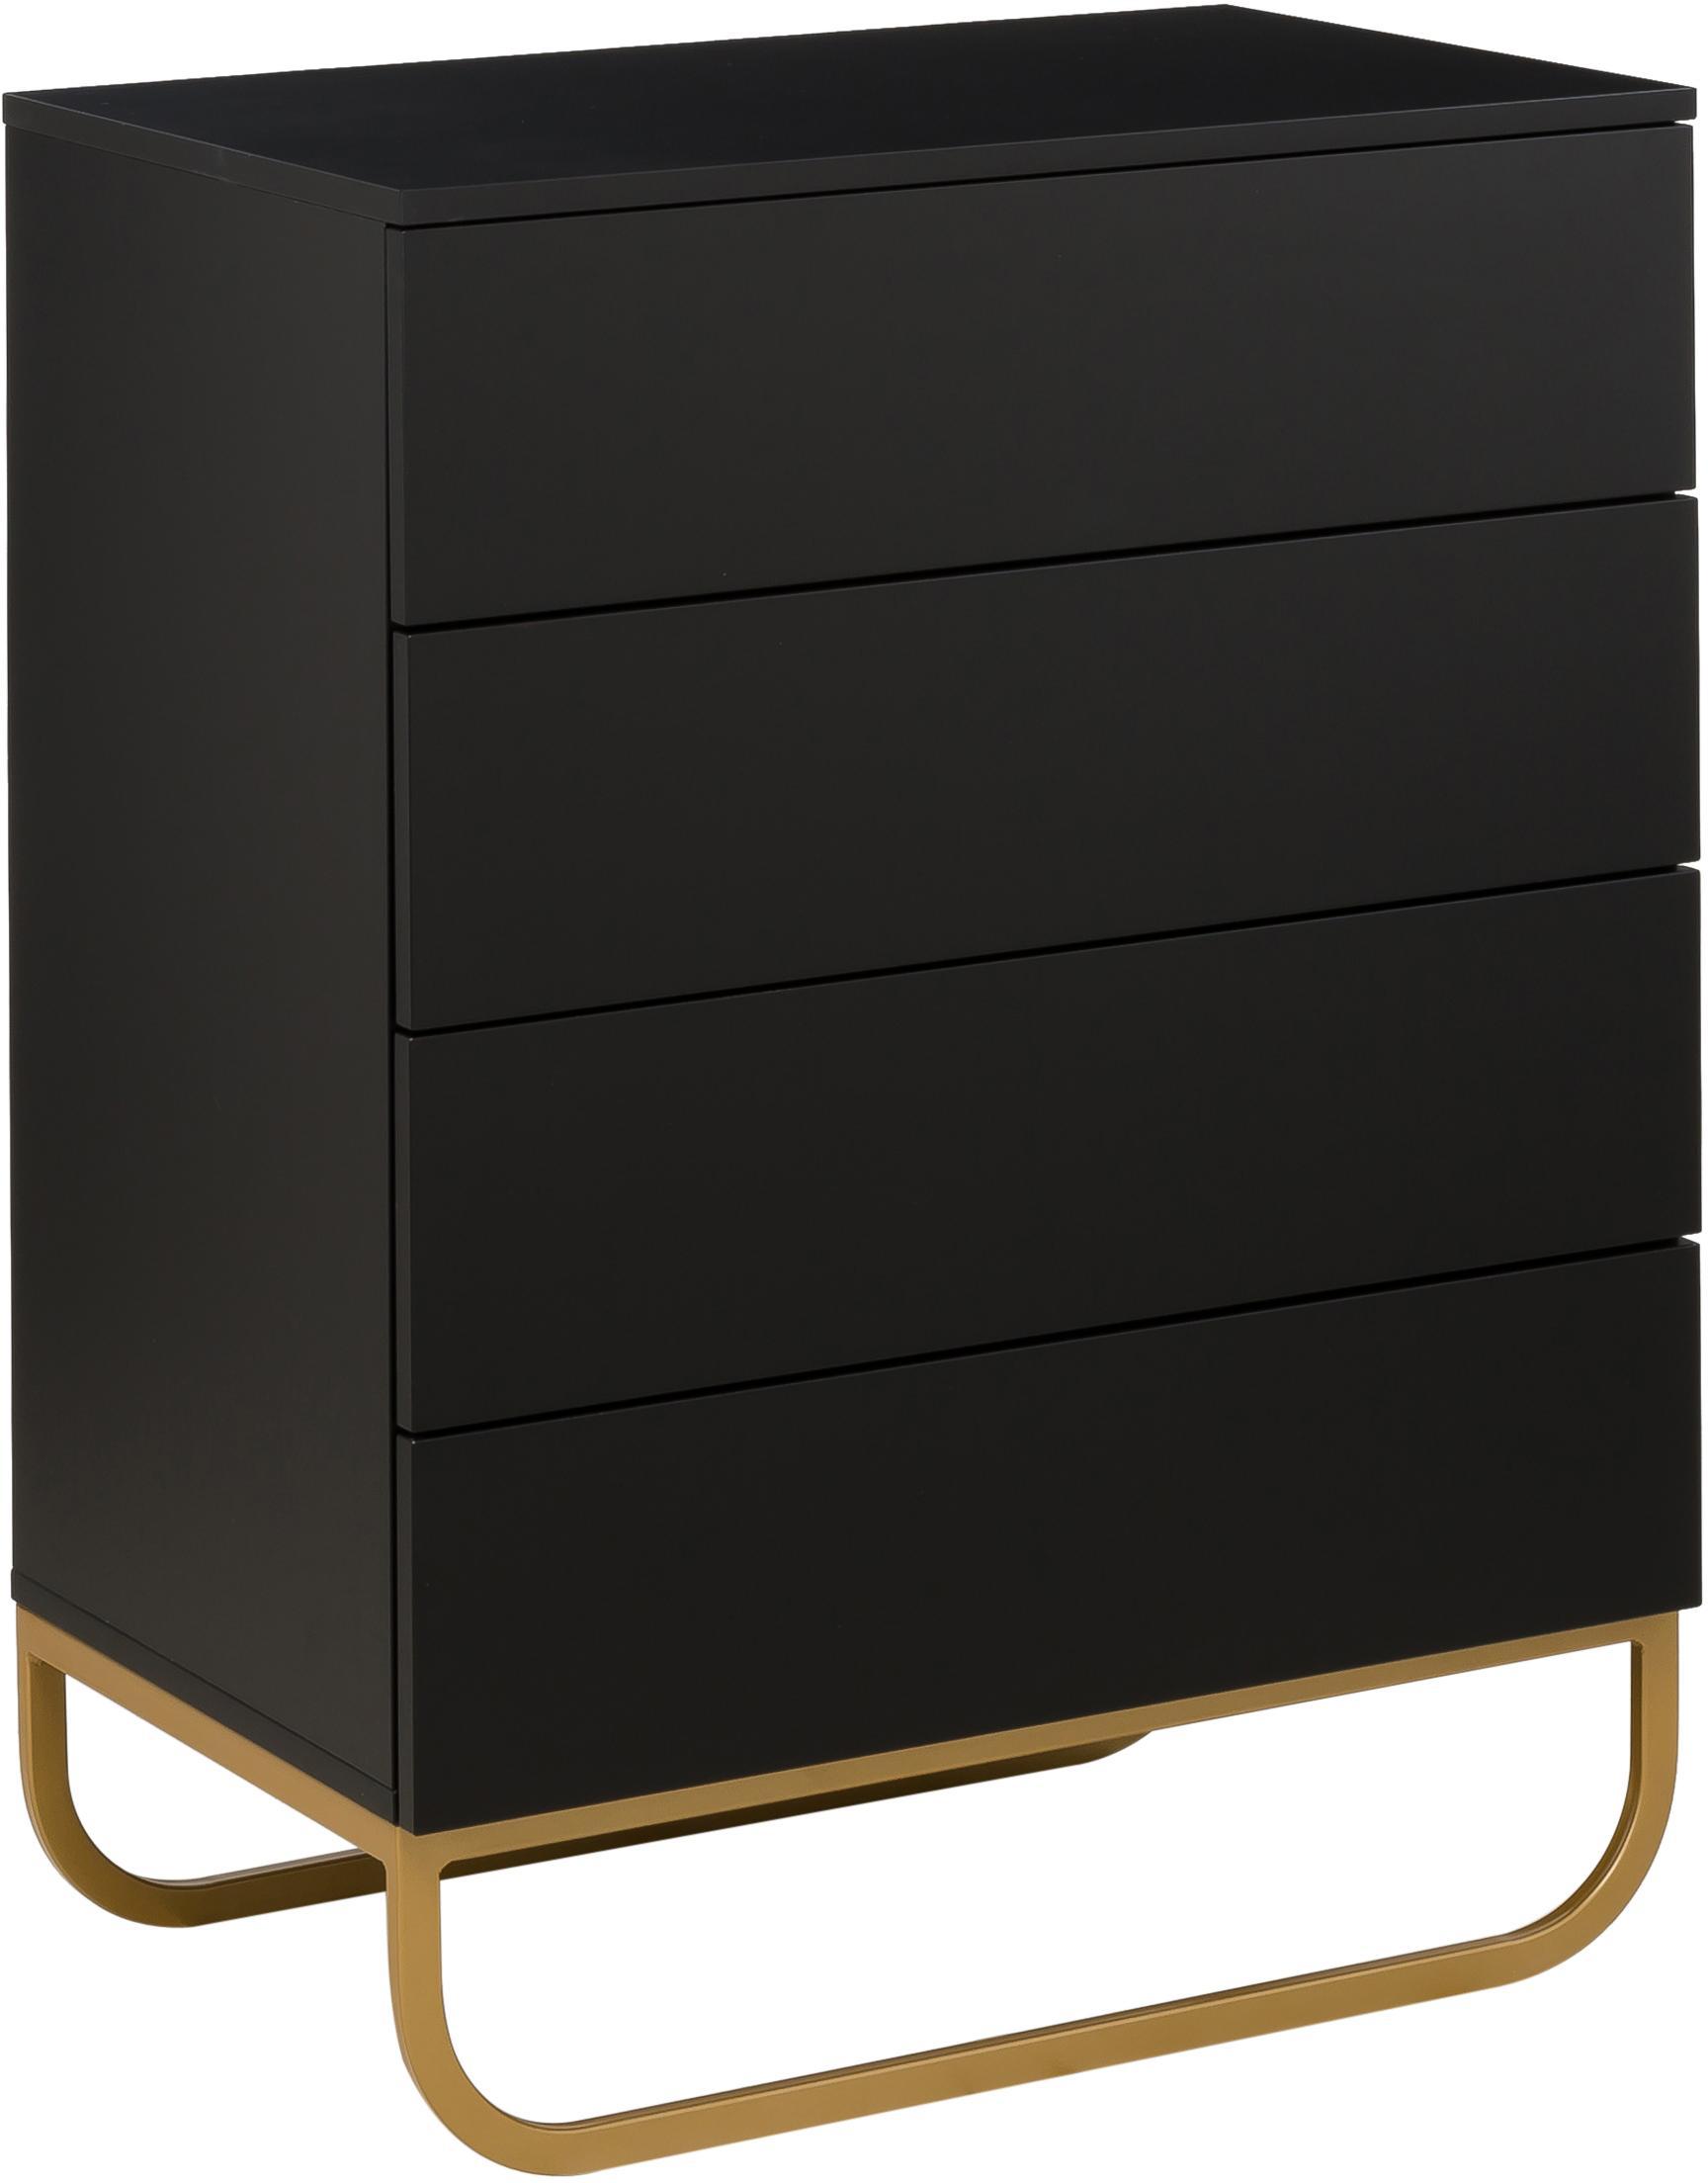 Ladekast Sanford in zwart, Frame: gelakt MDF, Frame: mat zwart. Onderstel: mat goudkleurig, 80 x 106 cm